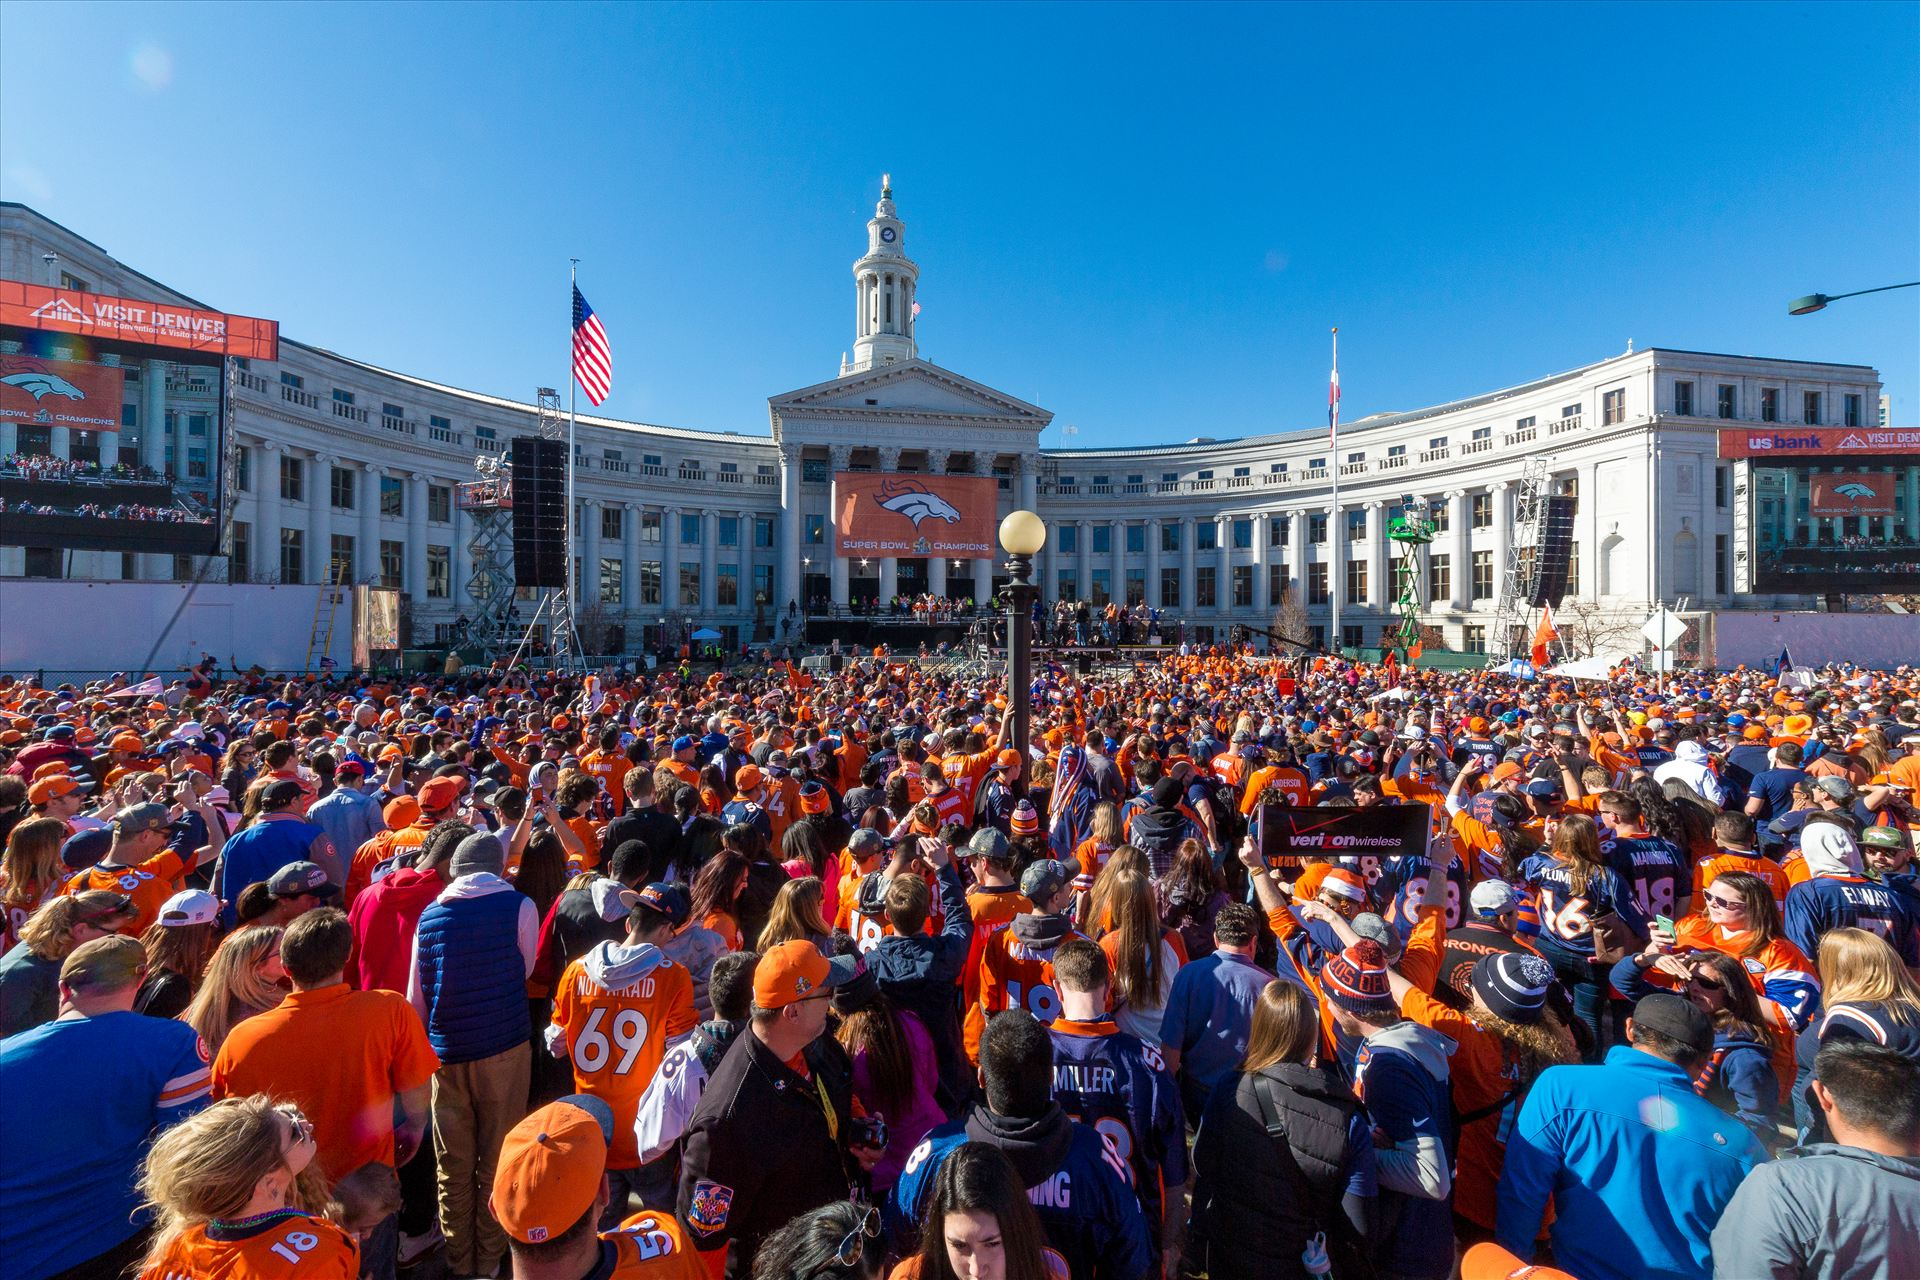 Broncos Fans at the Superbowl Victory Celebration - The best fans in the world descend on Civic Center Park in Denver Colorado for the Broncos Superbowl victory celebration. by D Scott Smith